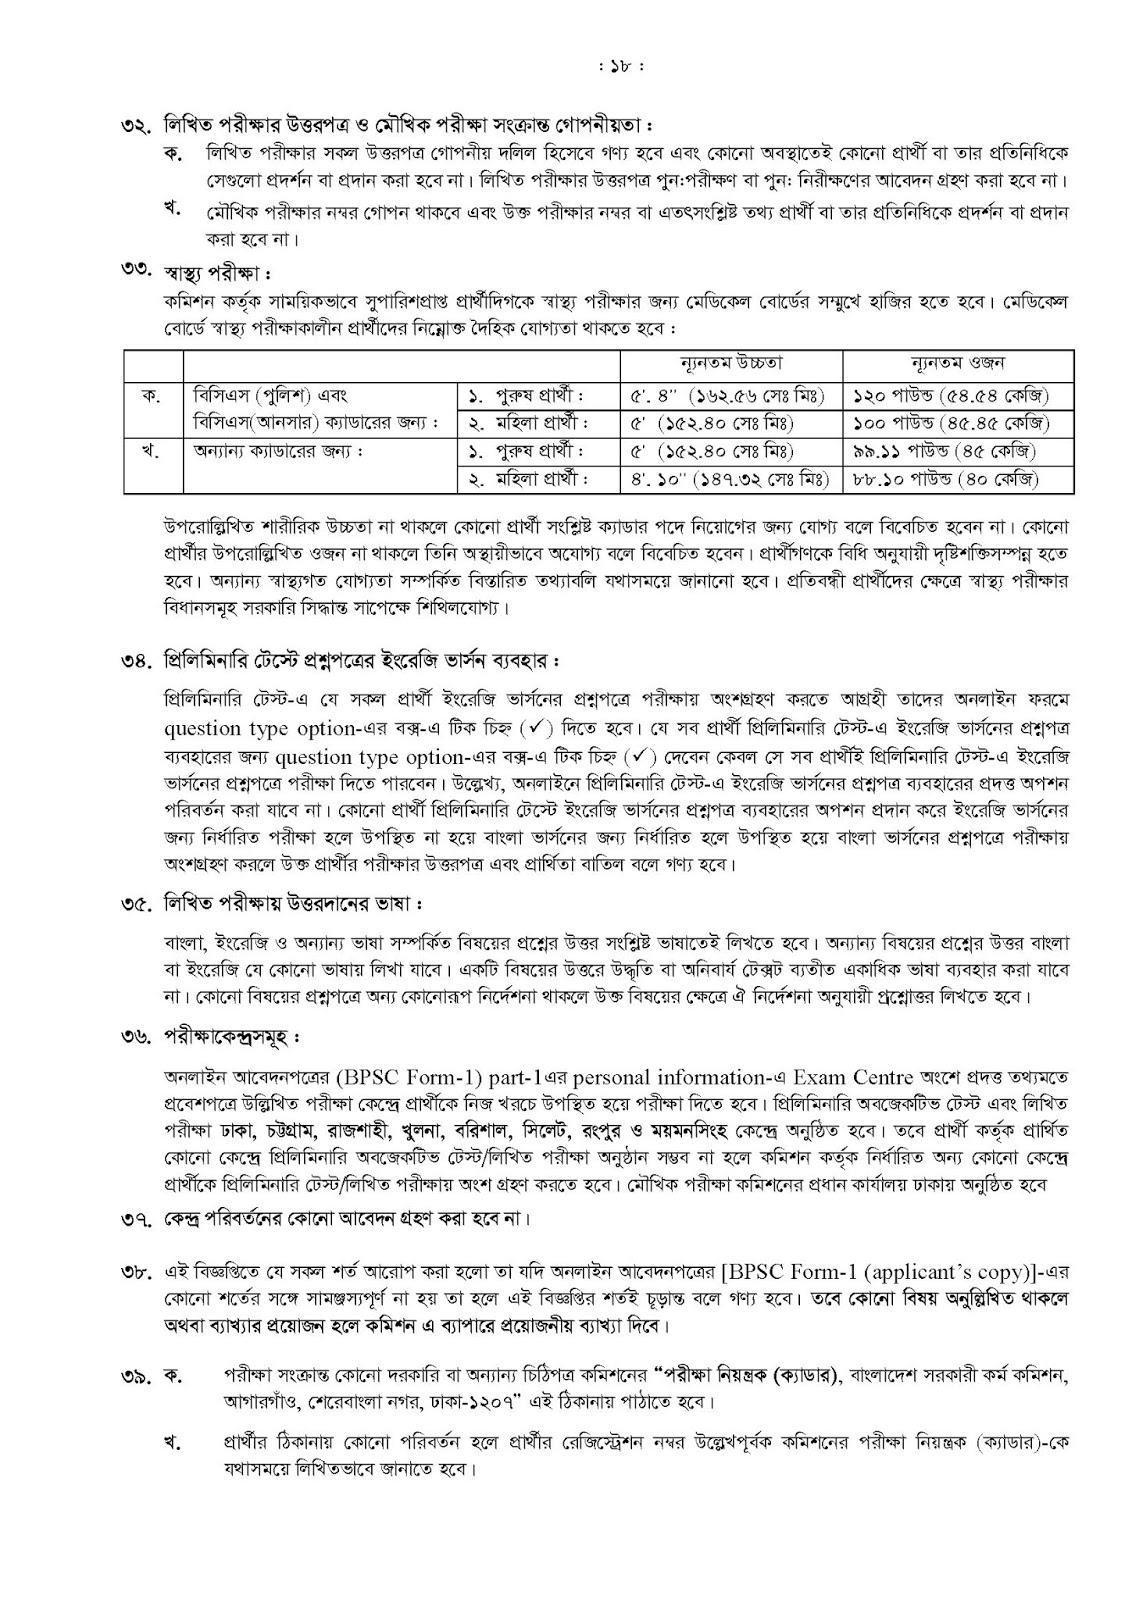 40th BCS Job Circular 2018 www bpsc gov bd